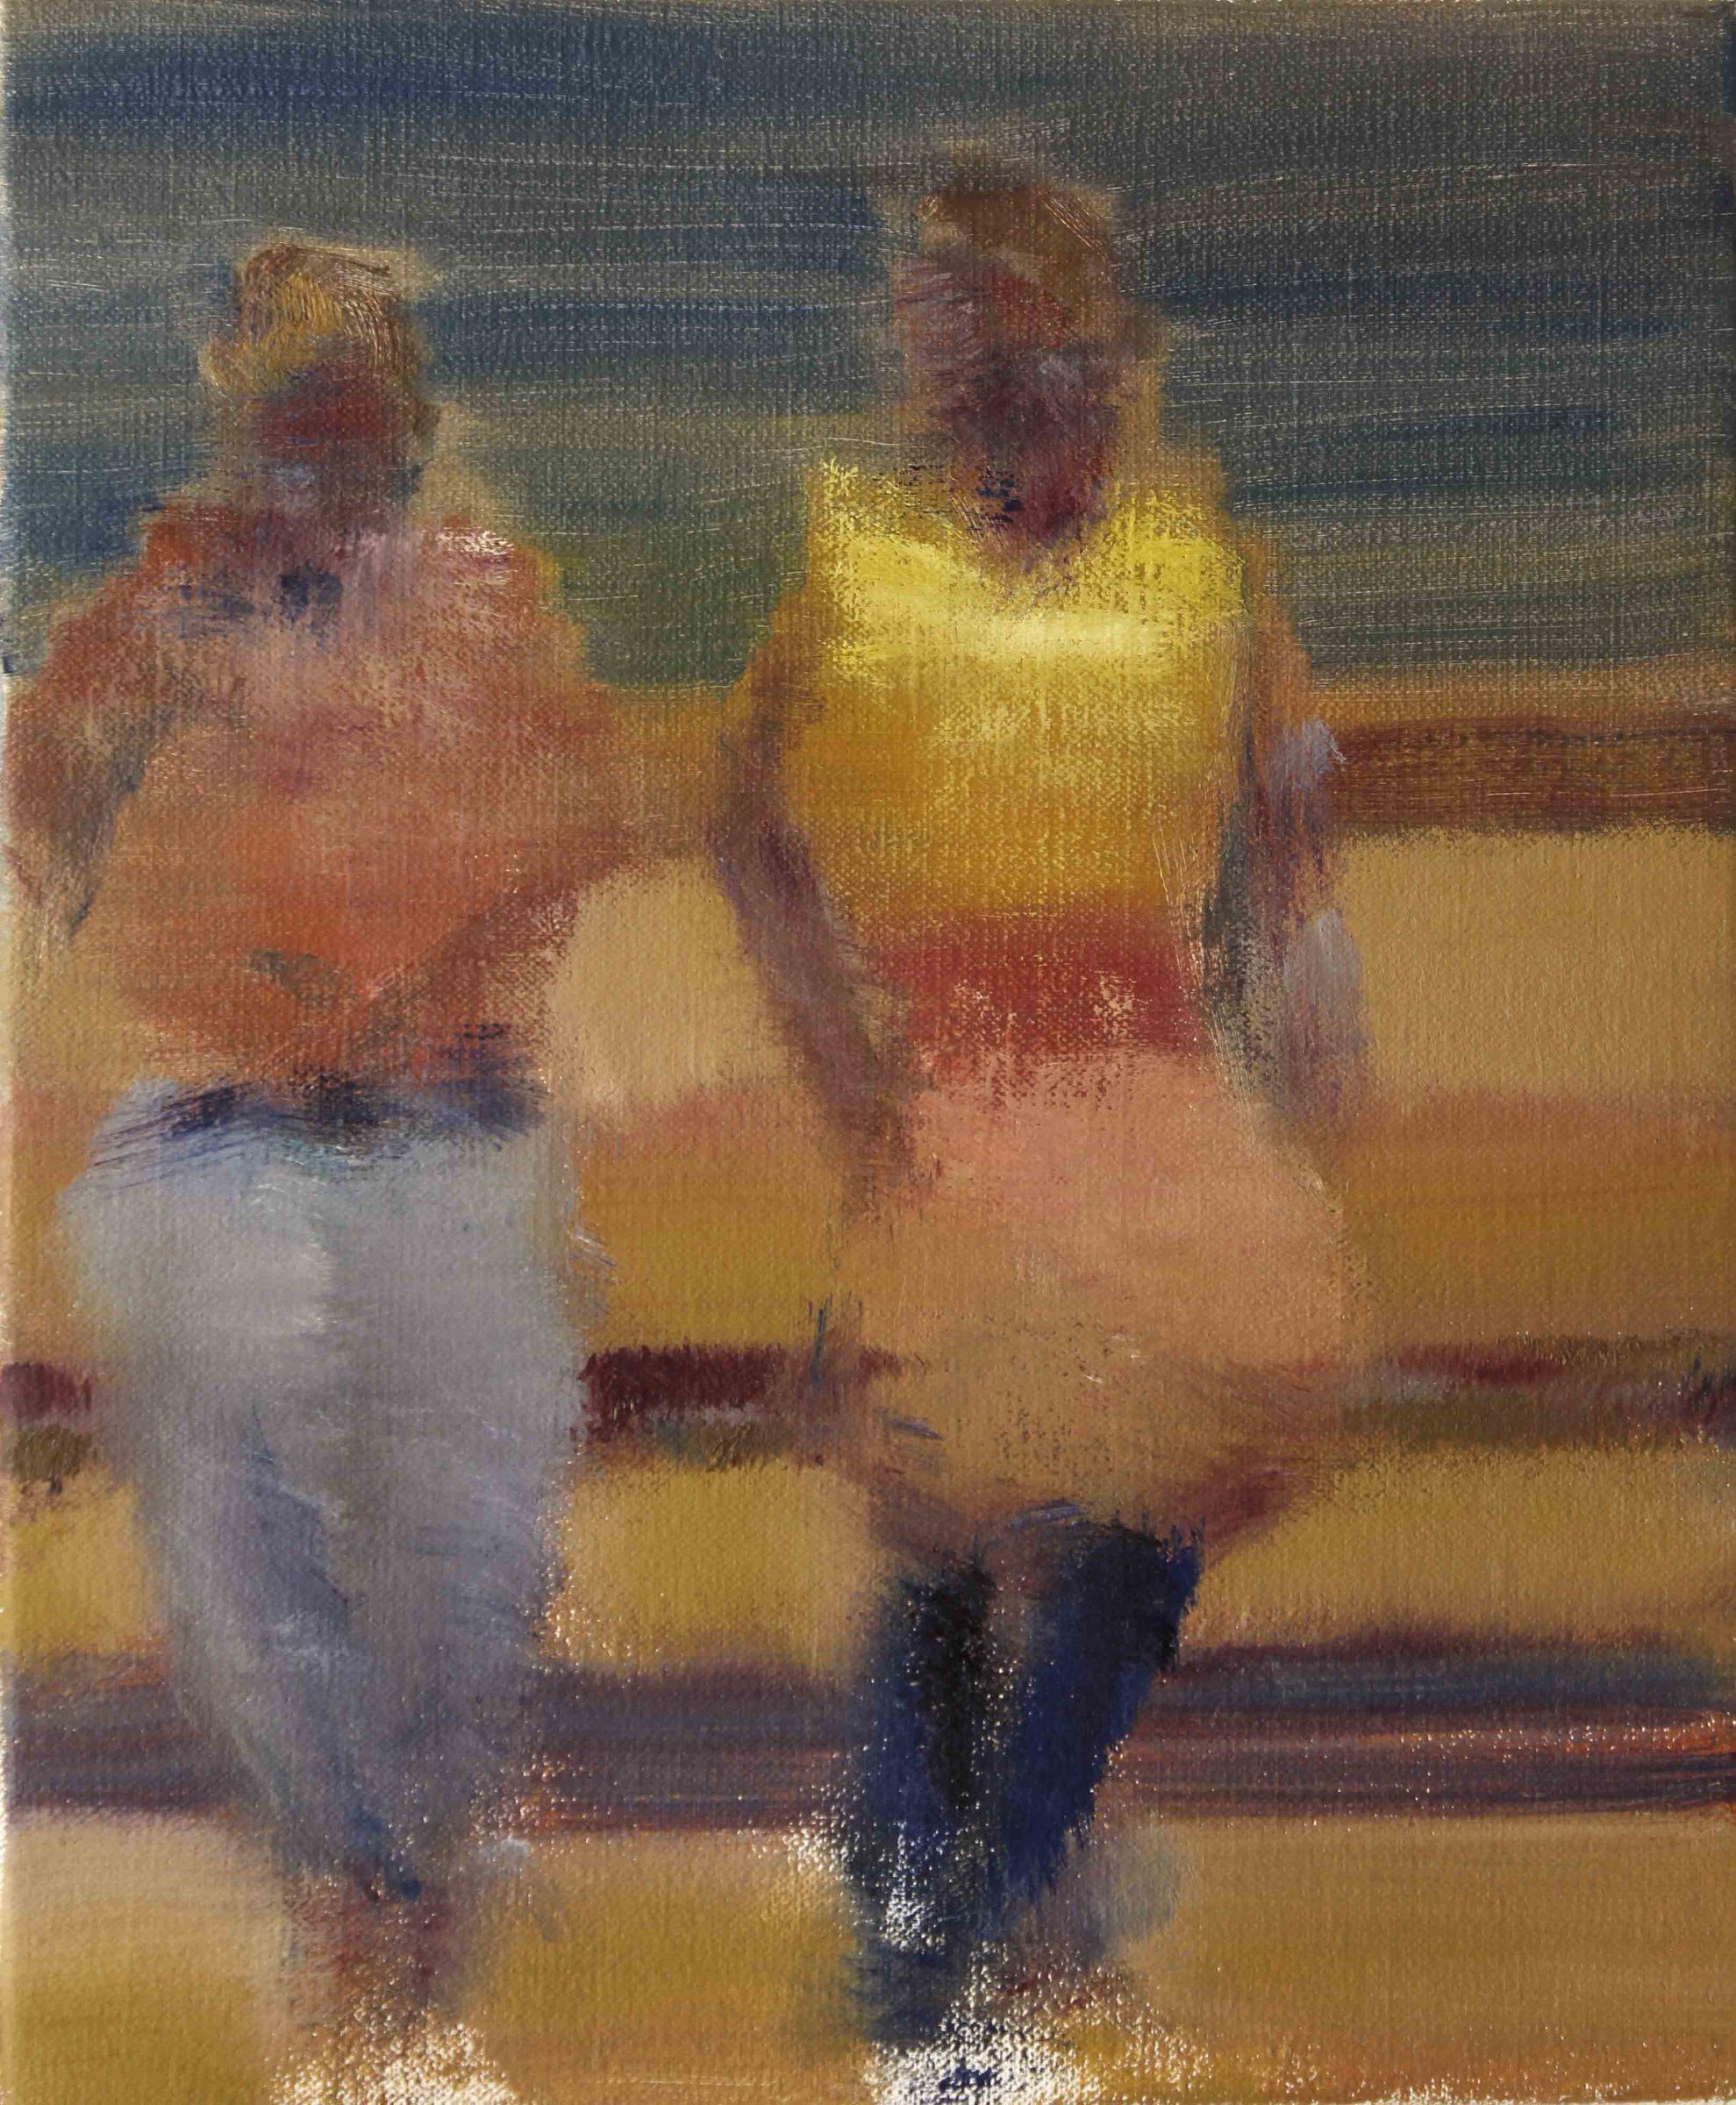 "<span class=""link fancybox-details-link""><a href=""/artists/59-simon-nicholas/works/541-simon-nicholas-gallery-study-3/"">View Detail Page</a></span><div class=""artist""><strong>Simon Nicholas</strong></div> <div class=""title""><em>Gallery Study 3</em></div> <div class=""medium"">Oil on Linen</div> <div class=""dimensions"">12.5 x 10 inches<br /> SOLD</div>"